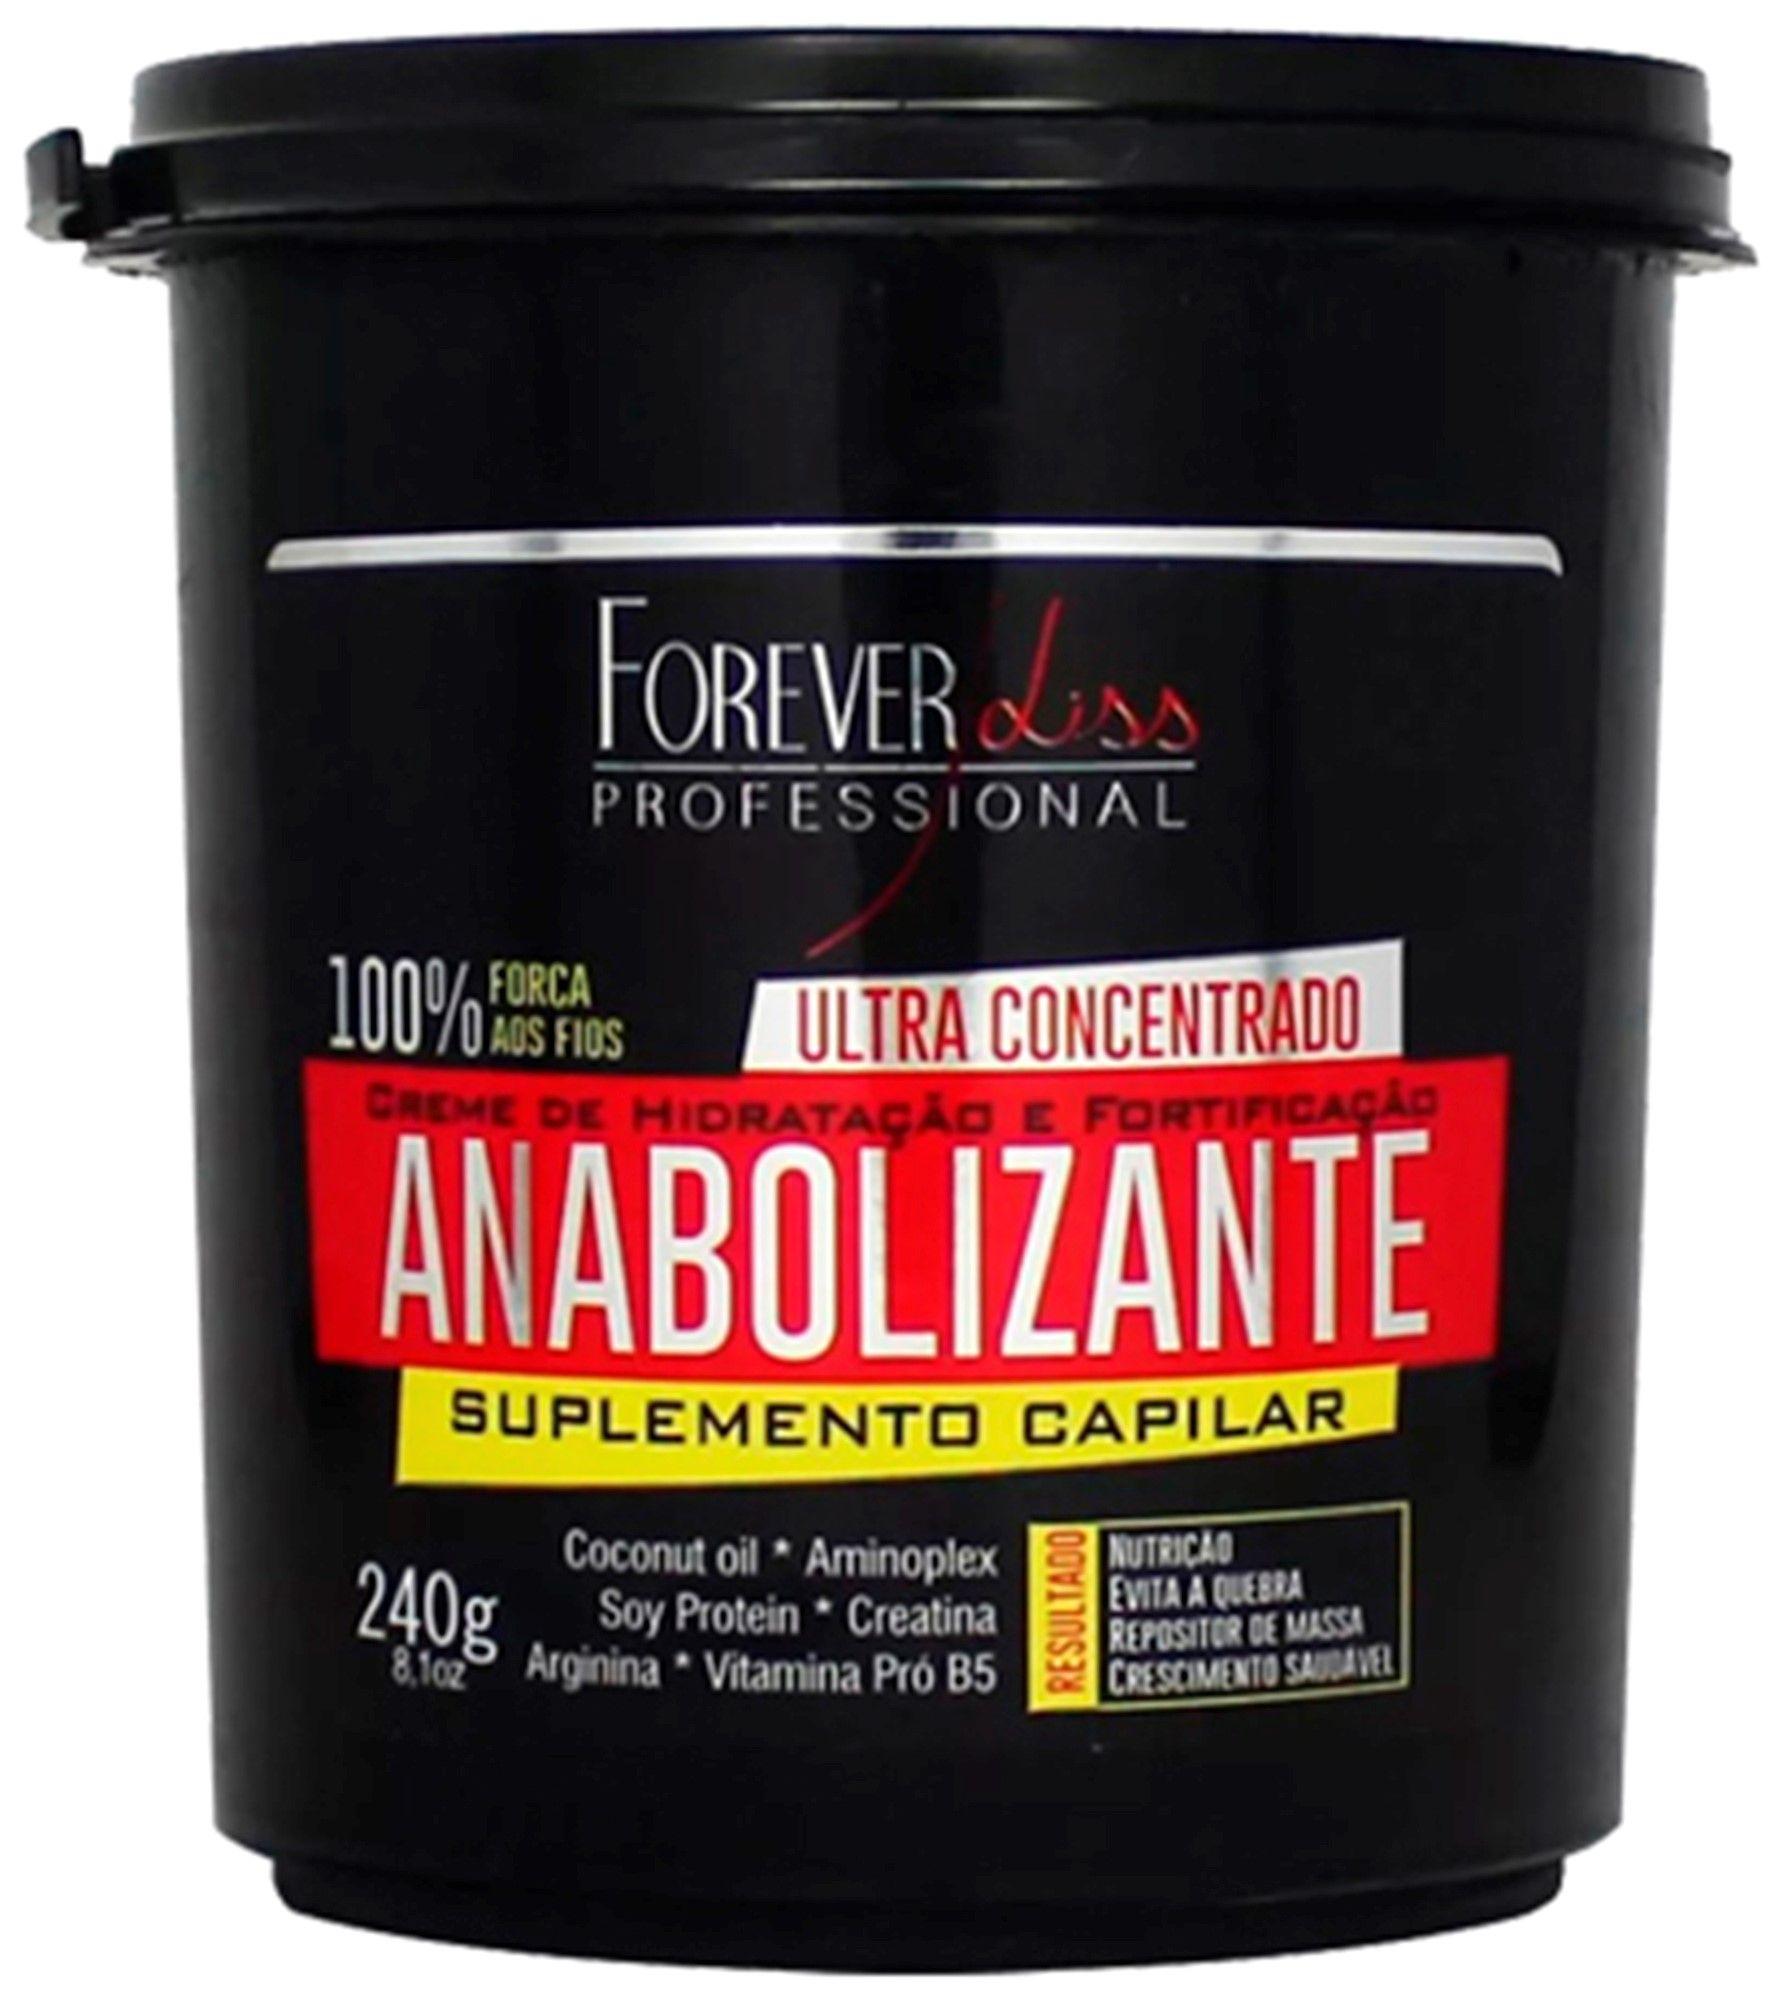 Kit Anabolizante Capilar Shampoo 1l Creme Hidratação 950g